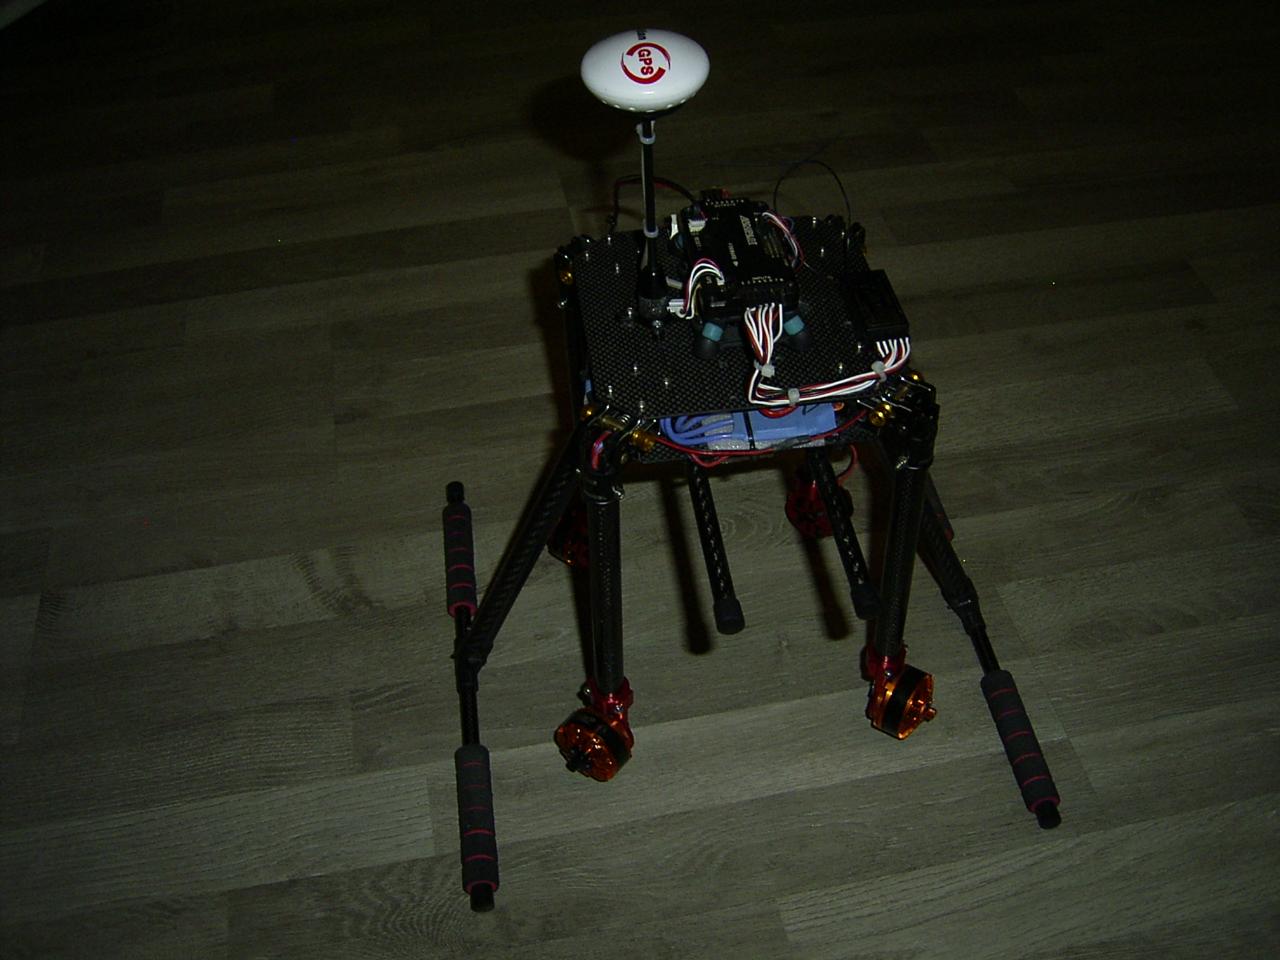 RIMG0526.JPG